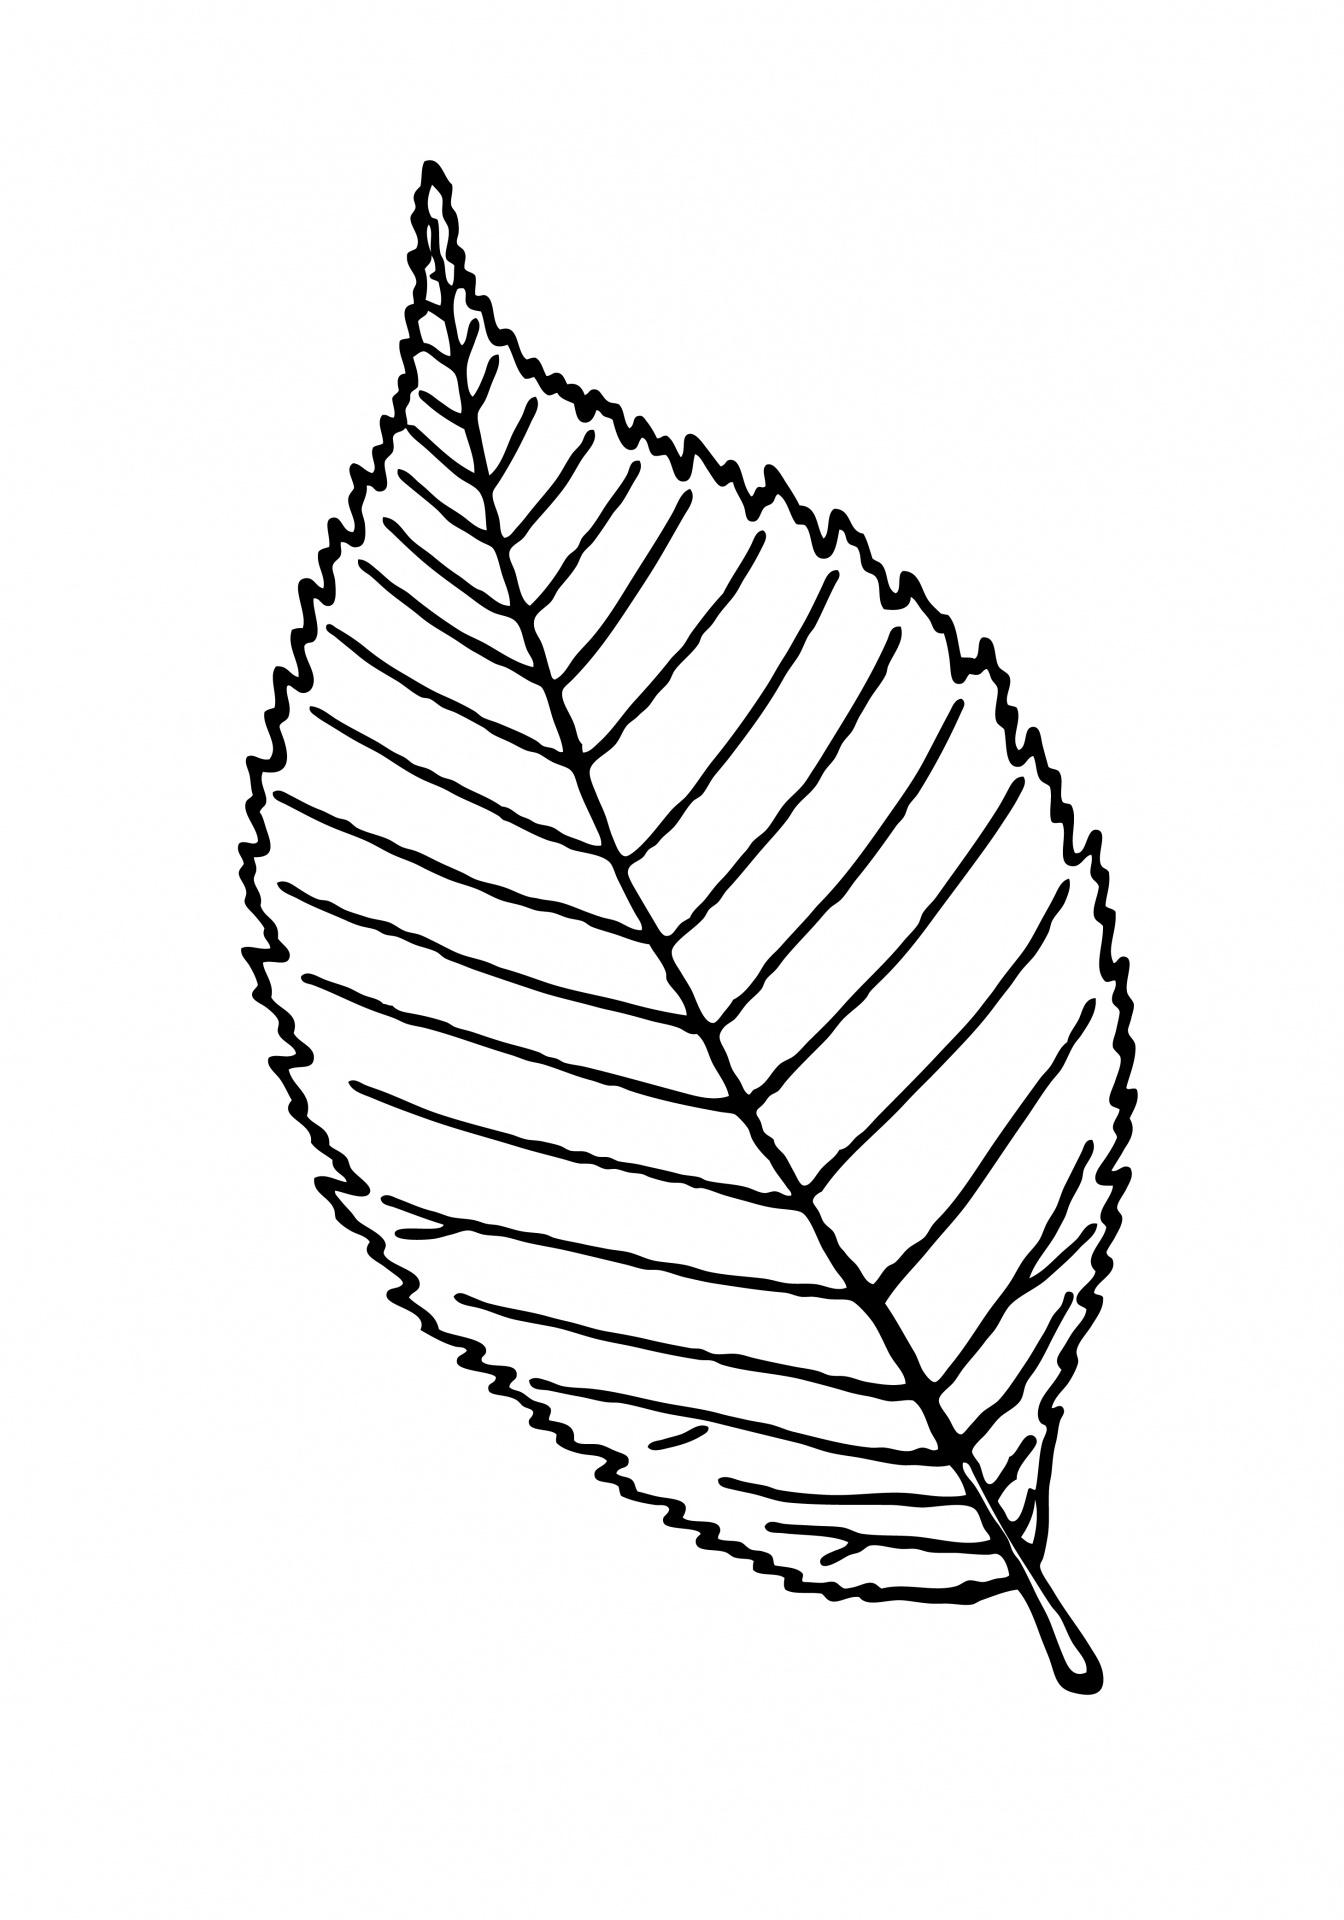 Leaf Outline Clipart Illustration Free Stock Photo